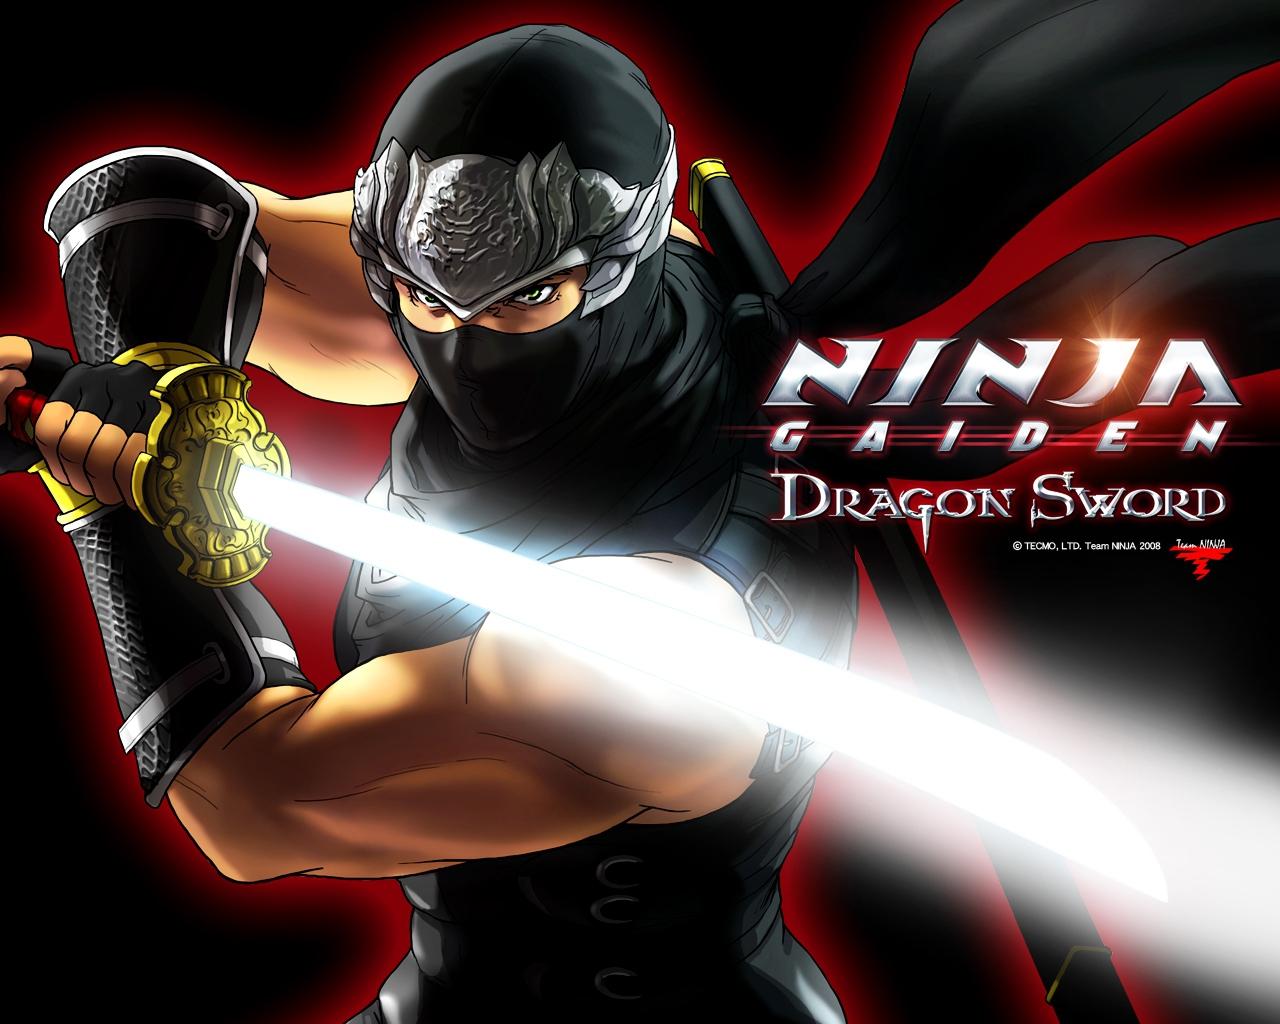 De protagonist is Ryu Hayabusa, de Dragon Ninja.